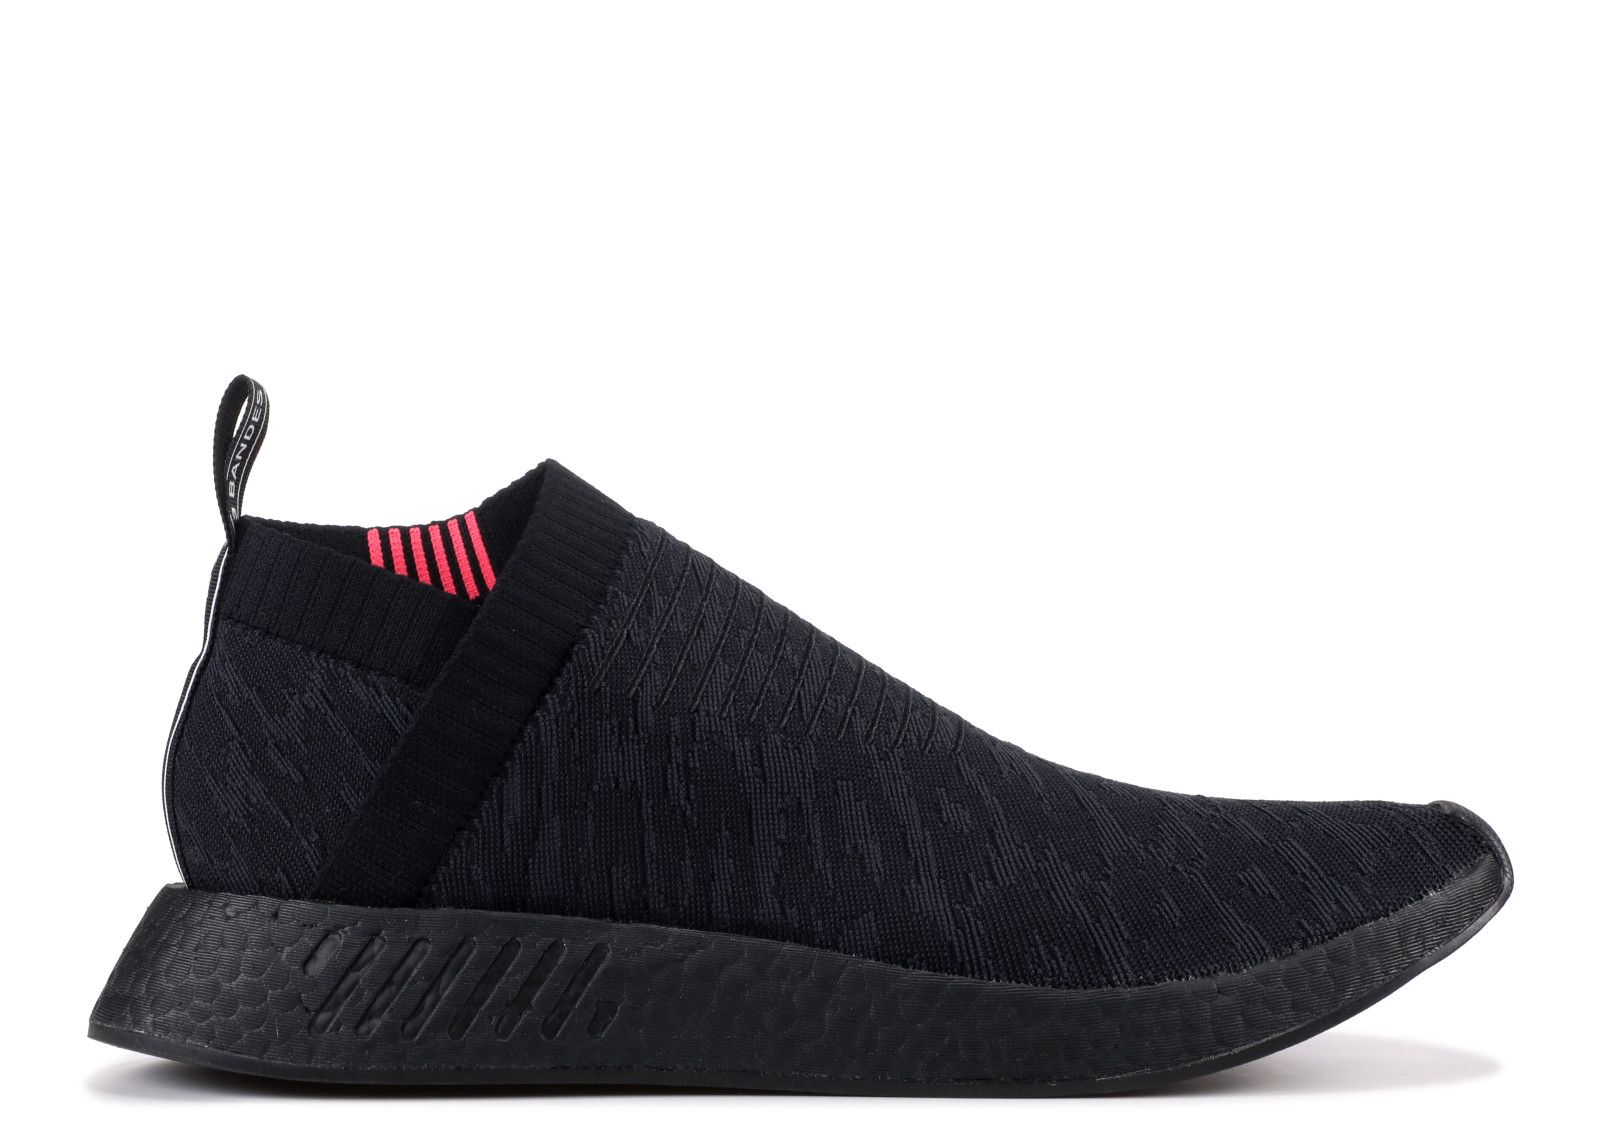 Pin By Majid On Adidas Fashion Shoes Sneakers Triple Black Adidas Nmd